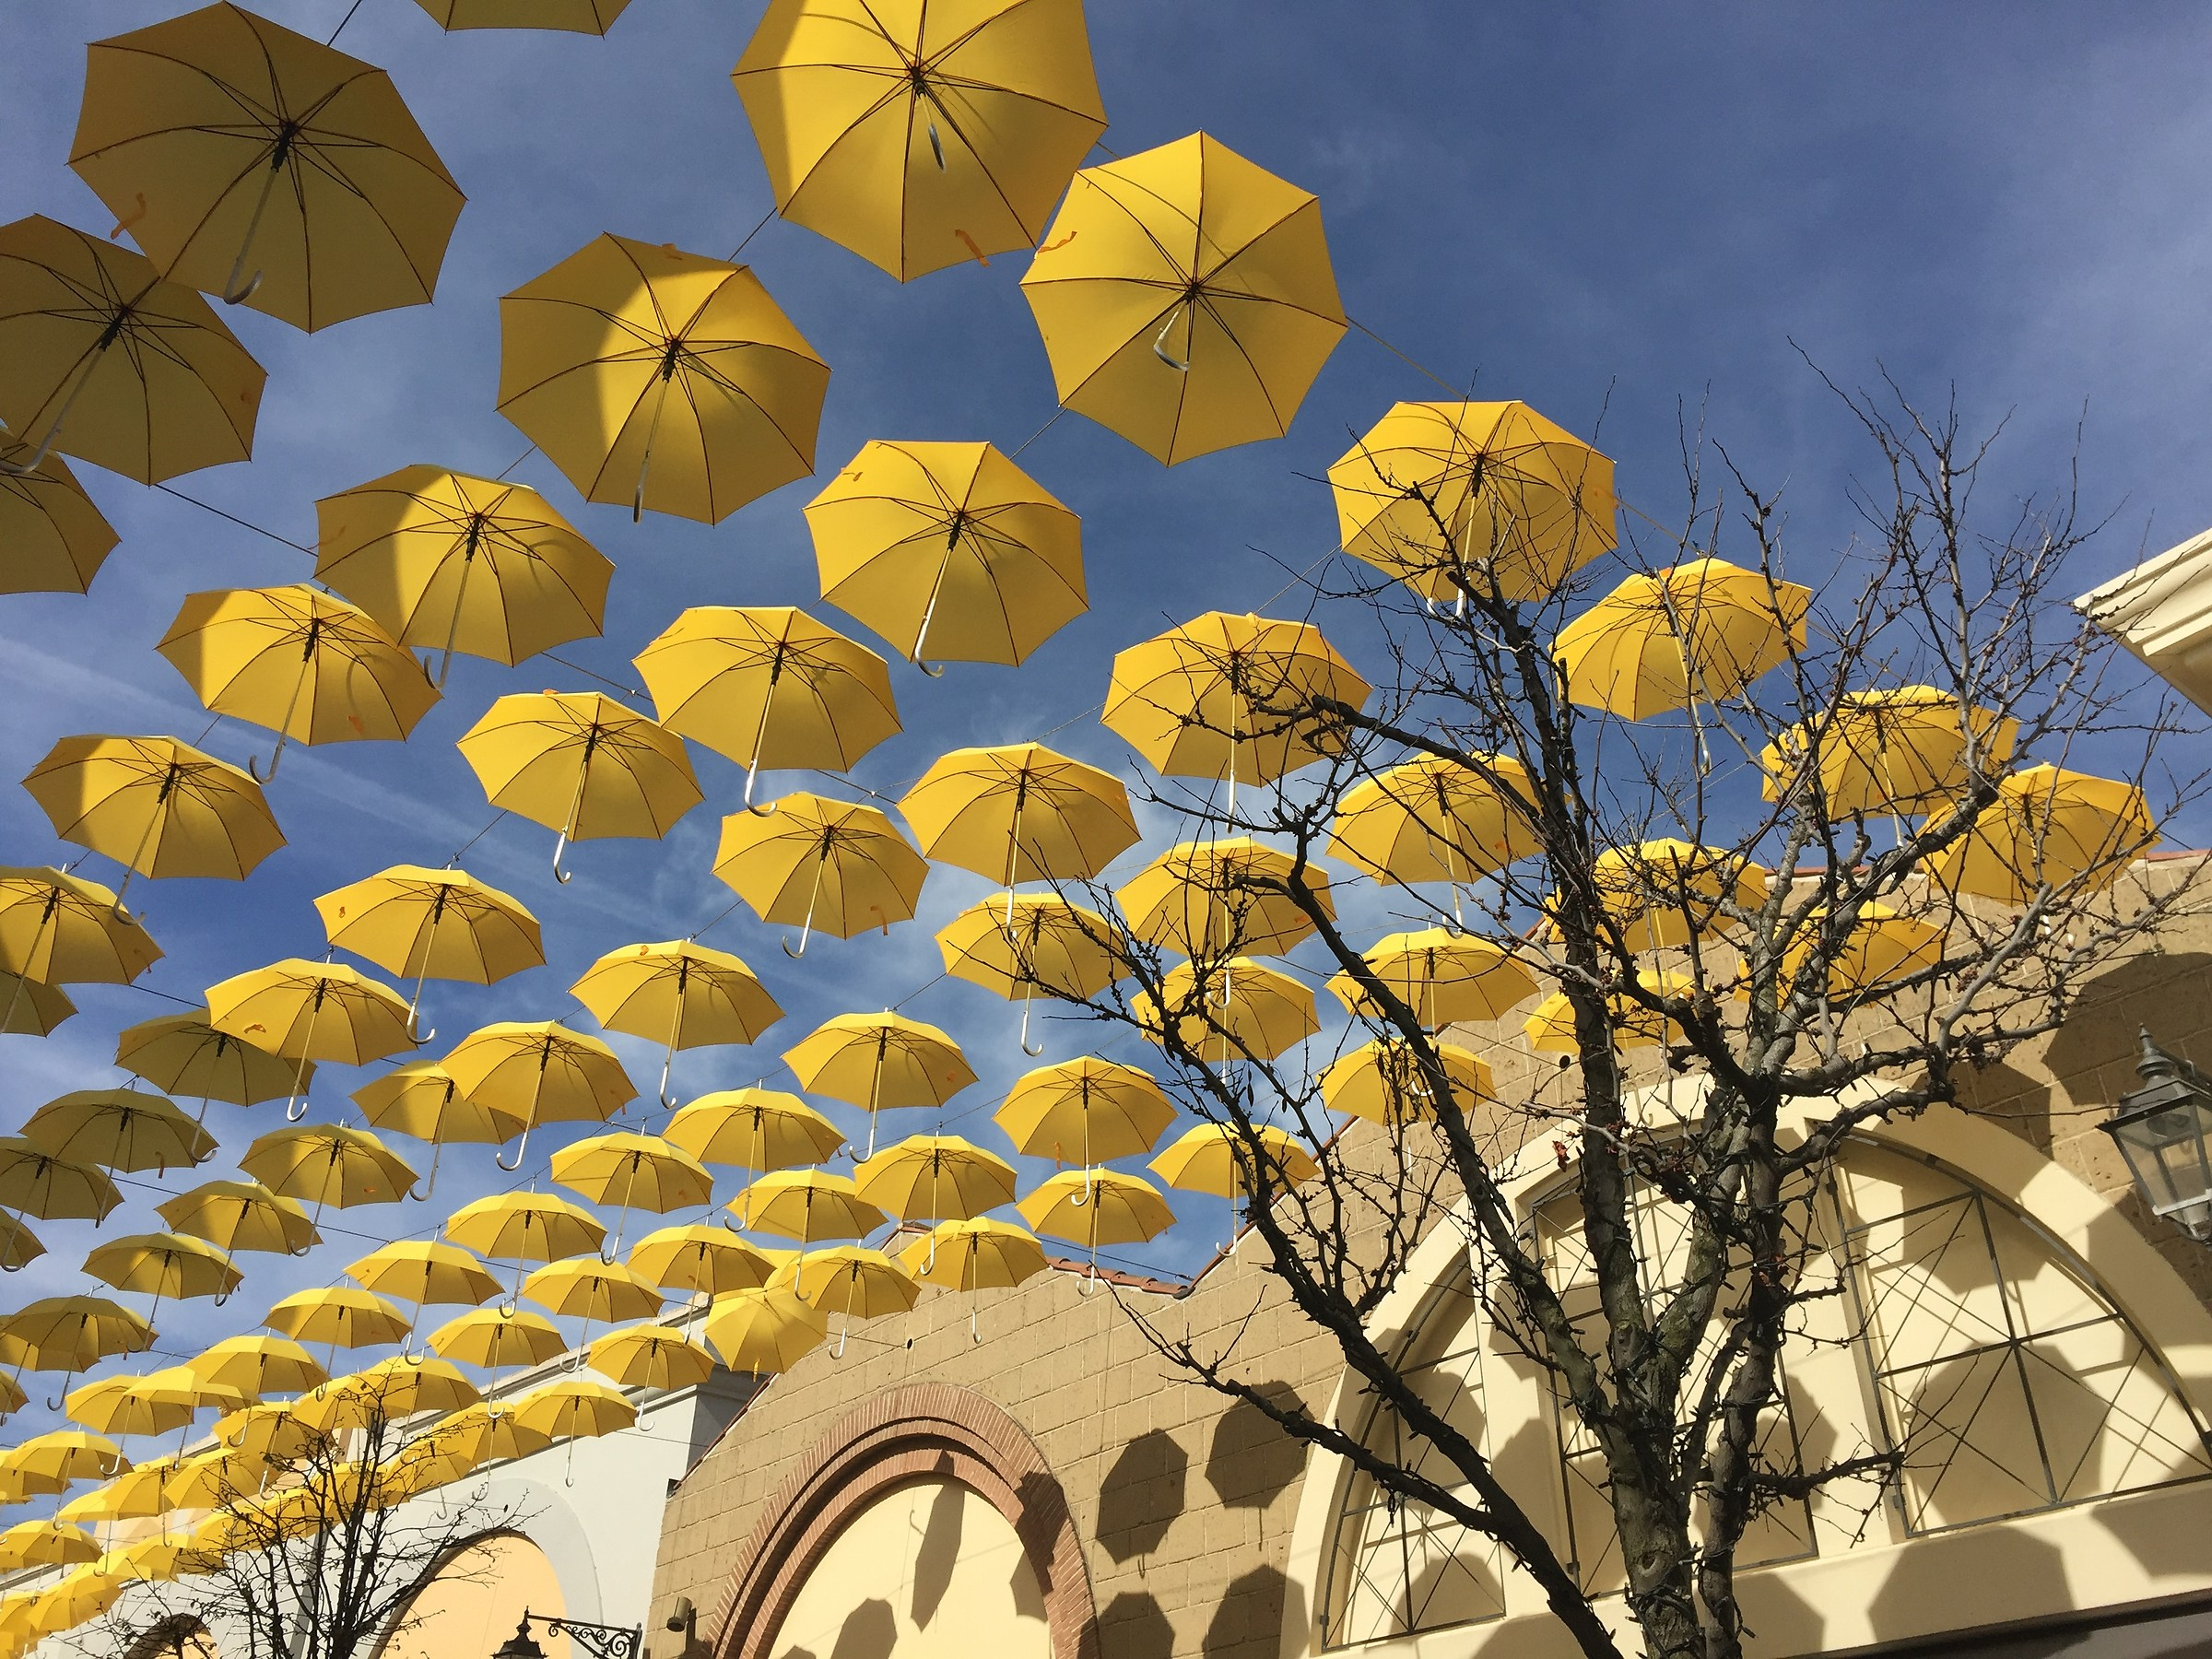 Umbrella in the Sky...